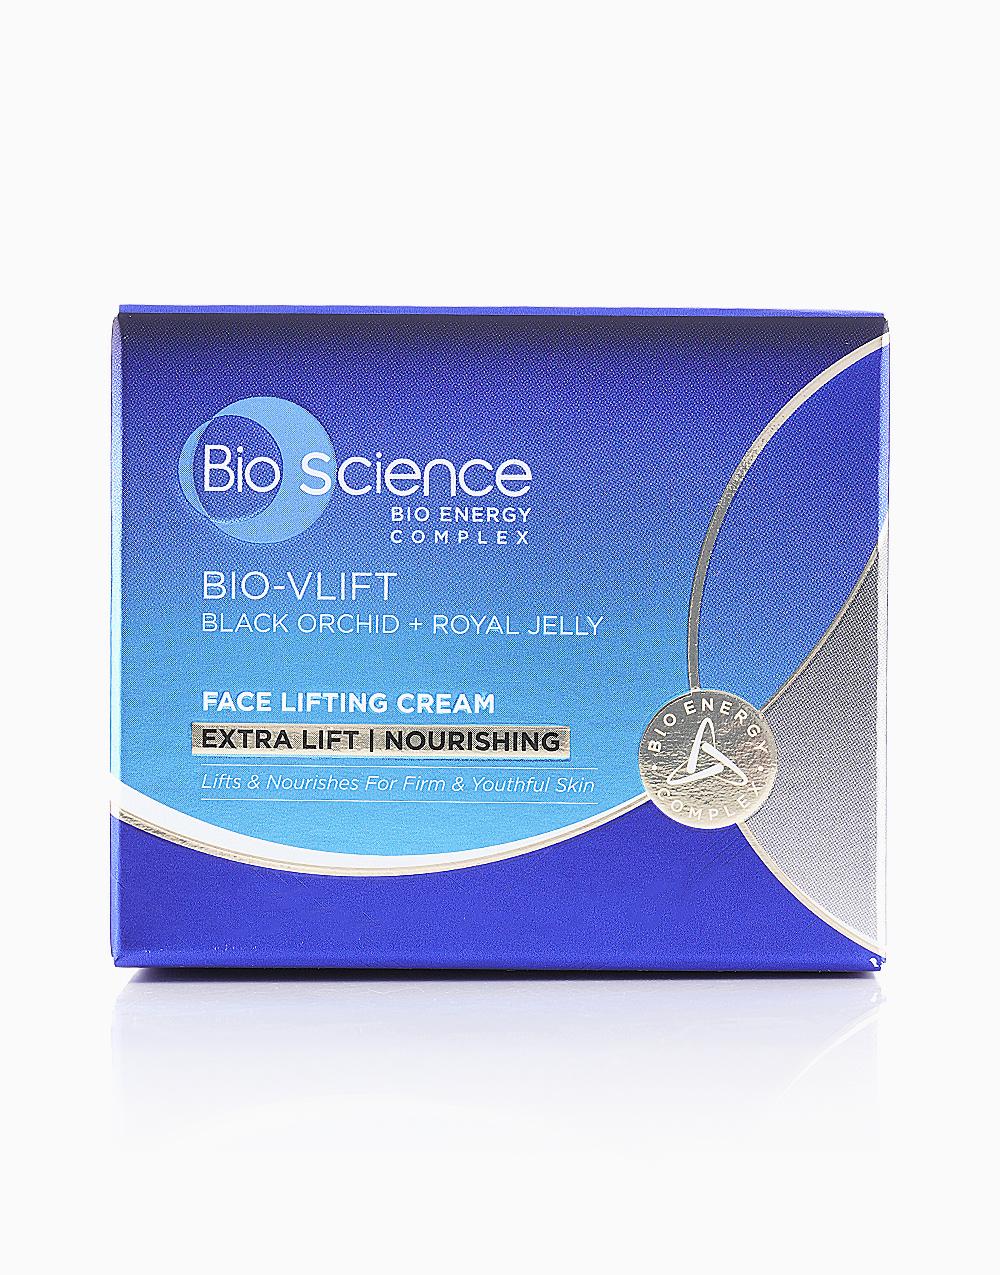 Bio-Vlift Face Lifting Cream Extra Lift Nourishing (45g) by Bio Science